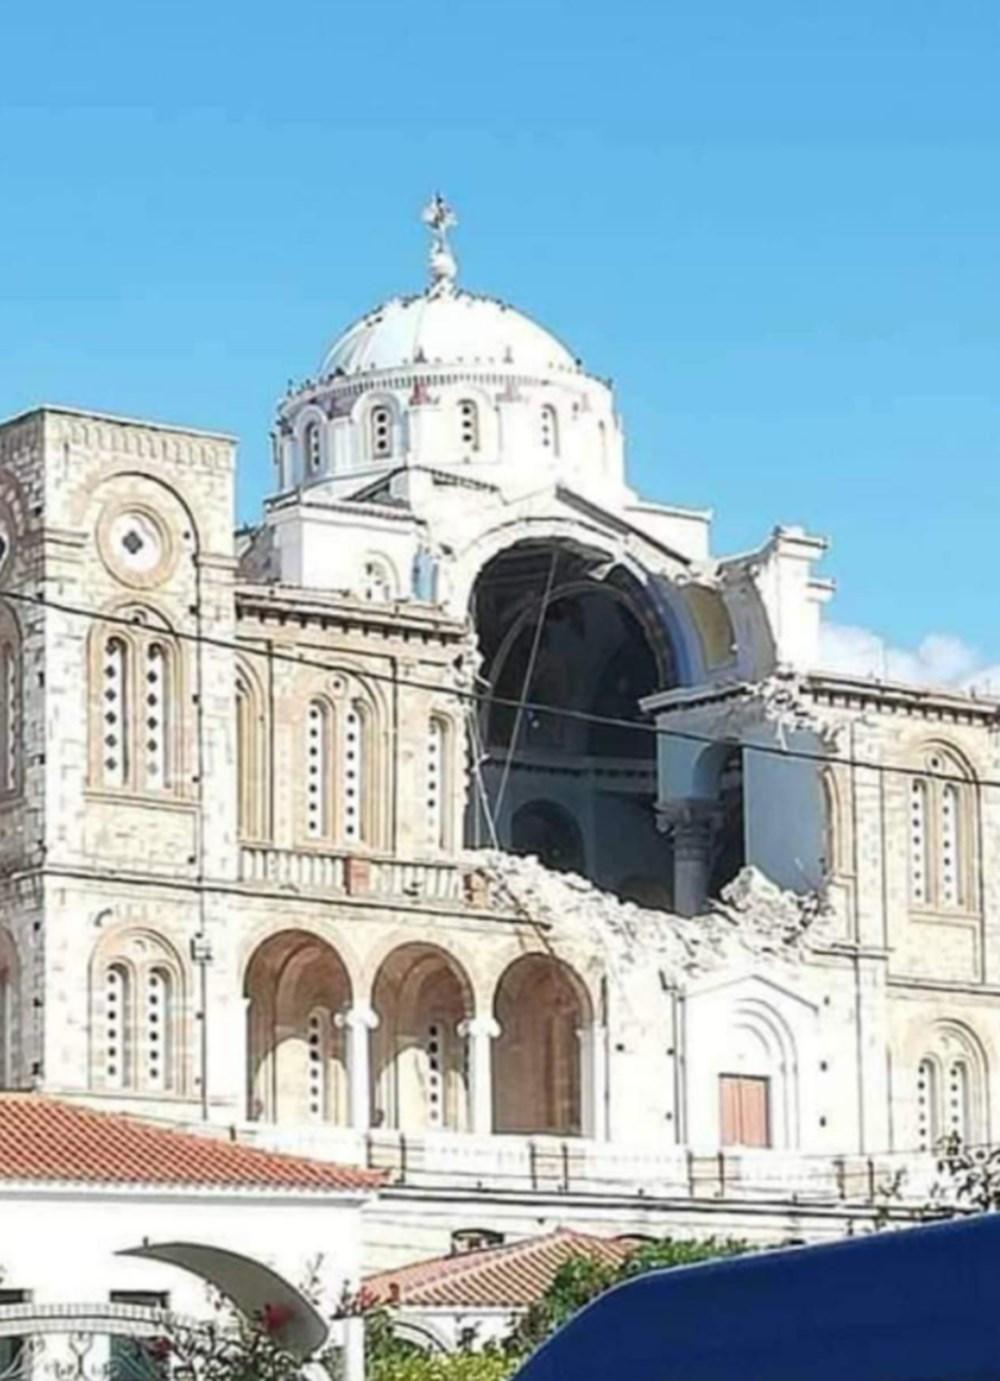 Depremin vurduğu Yunan adası Sisam'da son durum - 3